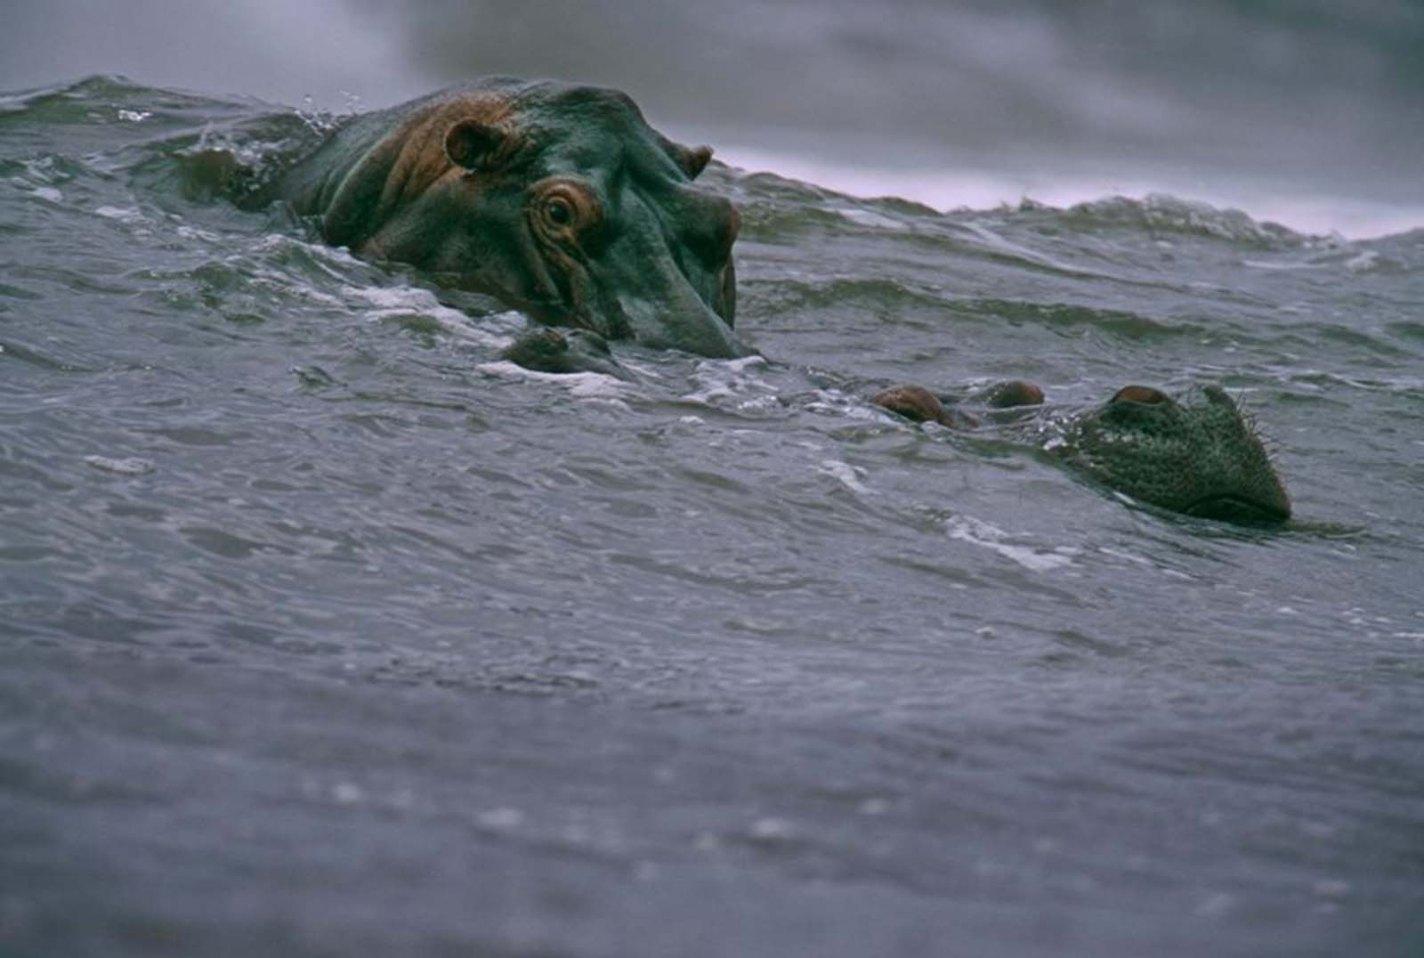 Surfing Hippos, Michael Nichols, 2000